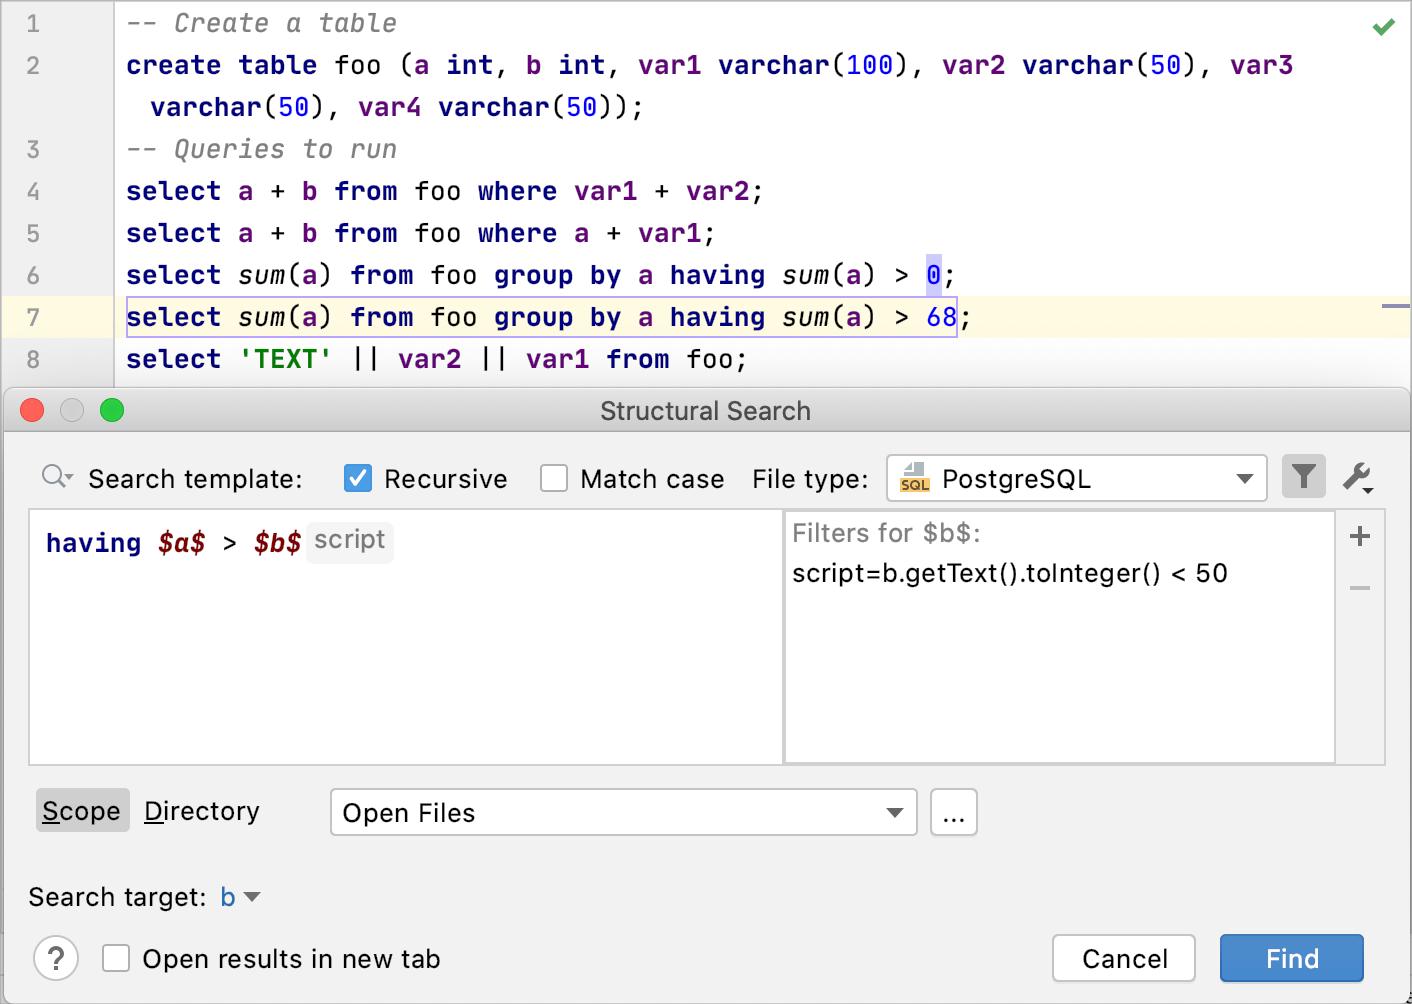 The Script filter